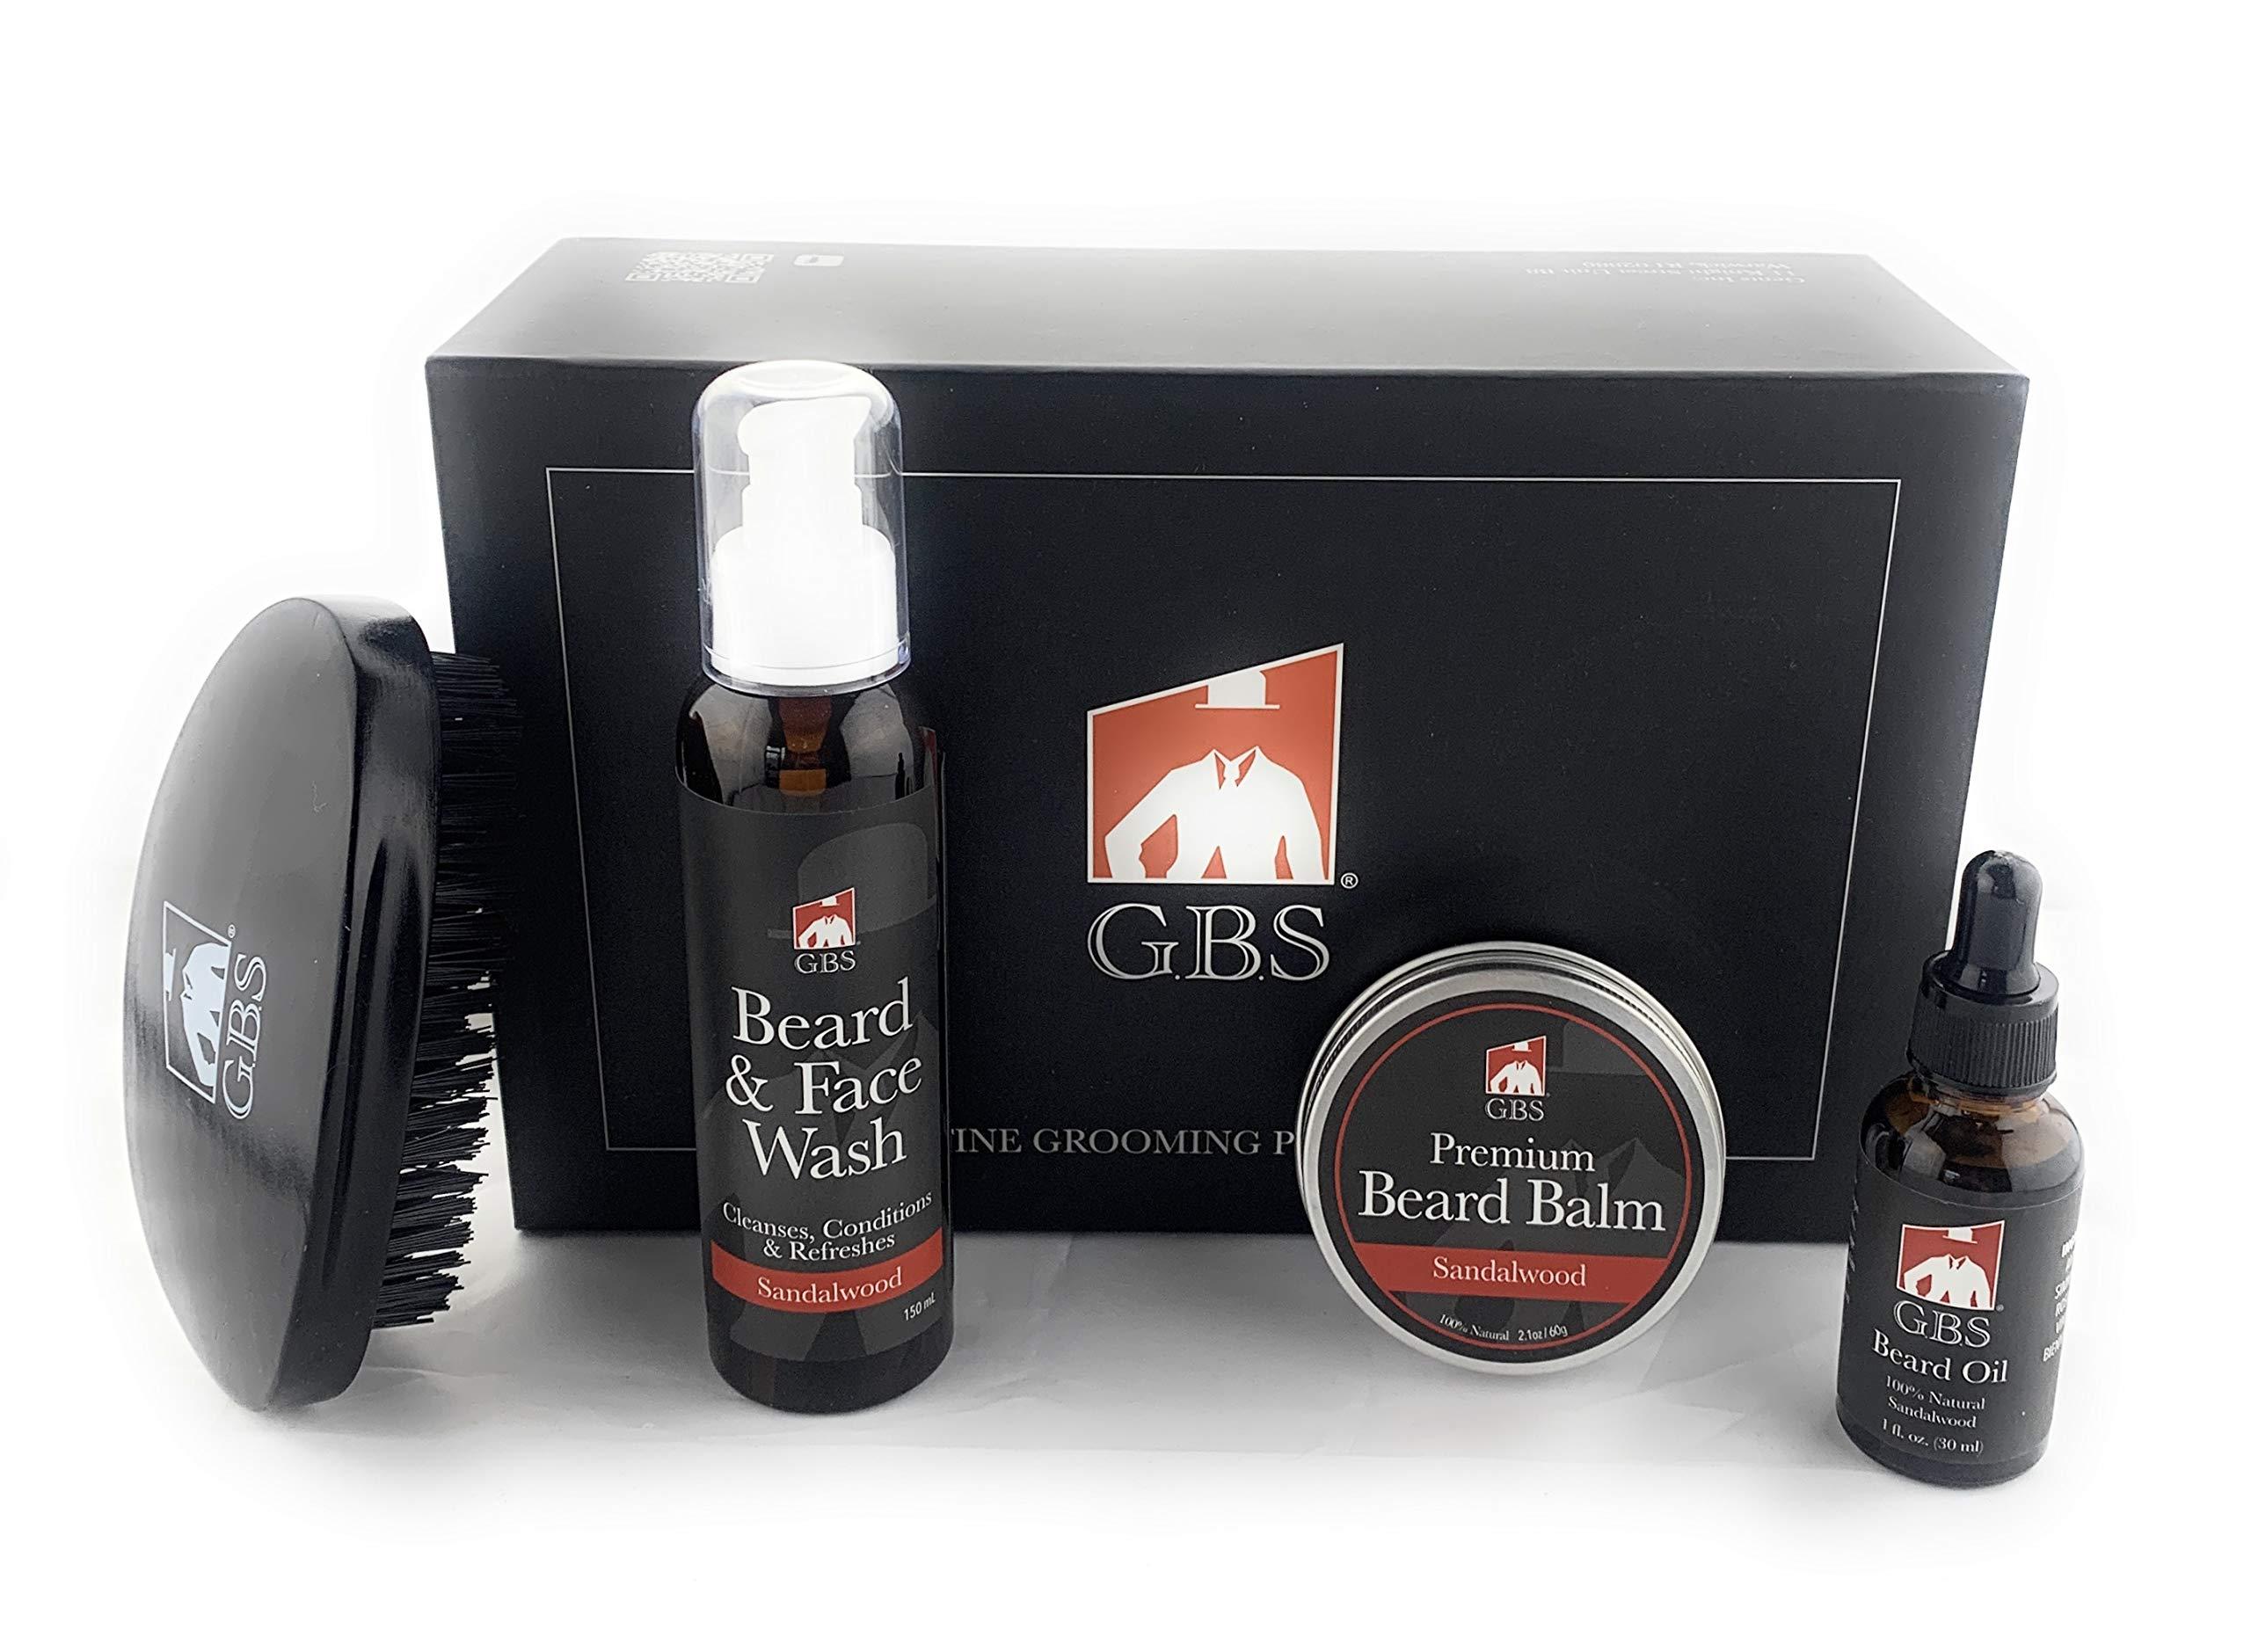 "GBS Sandalwood Beard Set - 100% Finest Military Style Brush 3"" x 5"" Oval Black Wood Finish Brush - Sandalwood 1 oz Beard Oil, Sandalwood Beard Balm 2.1 oz, and Sandalwood Beard Face Wash 150 mL"